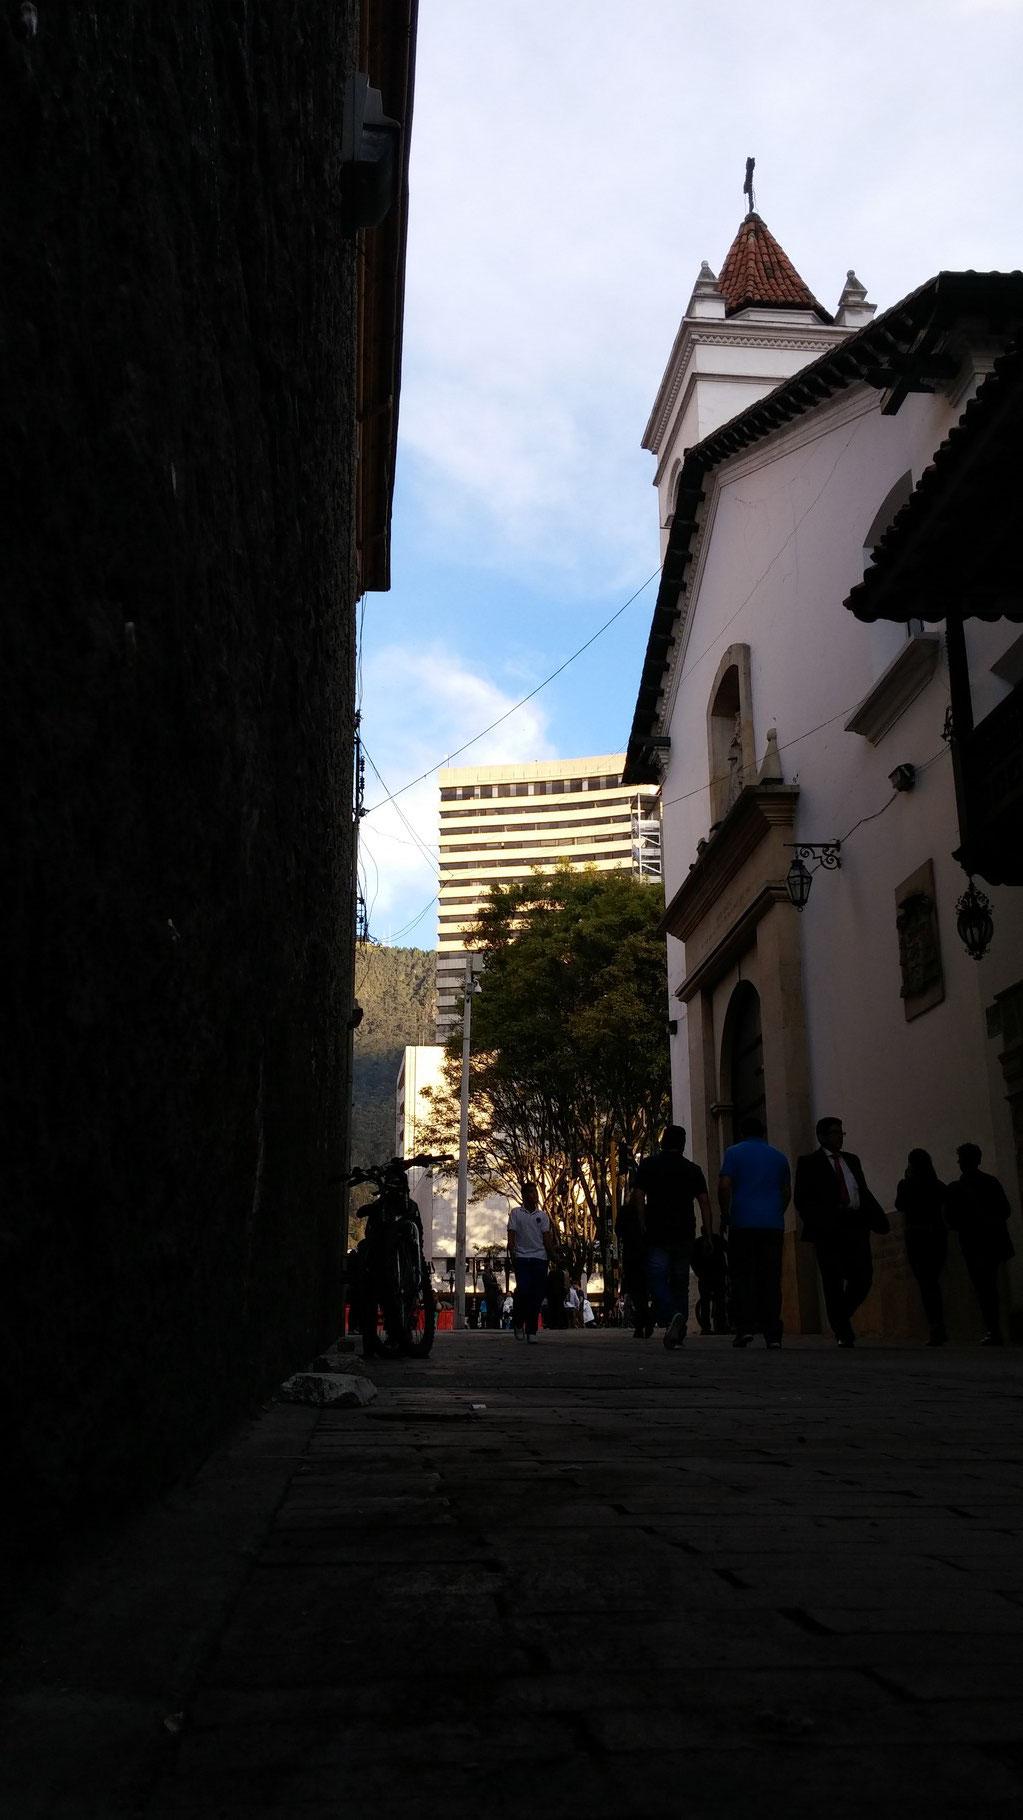 Adrian Espinosa - Calle 16 fiel observadora